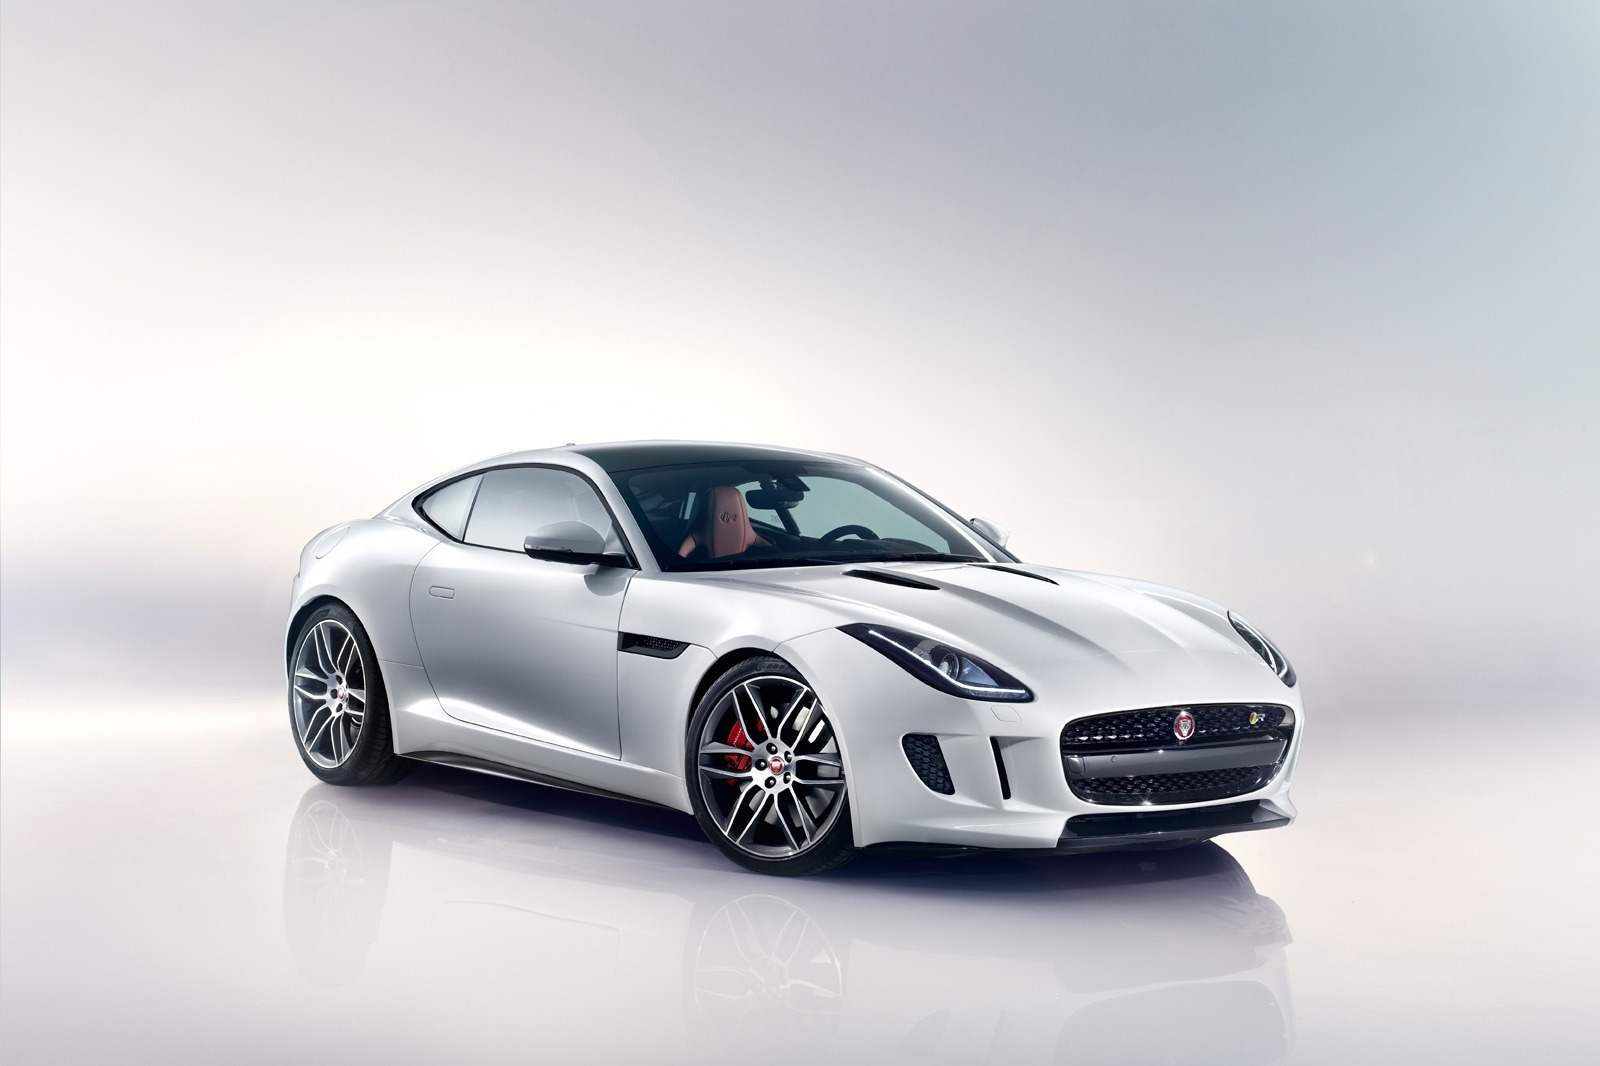 New-Jaguar-F-Type-Coupe-32[2]